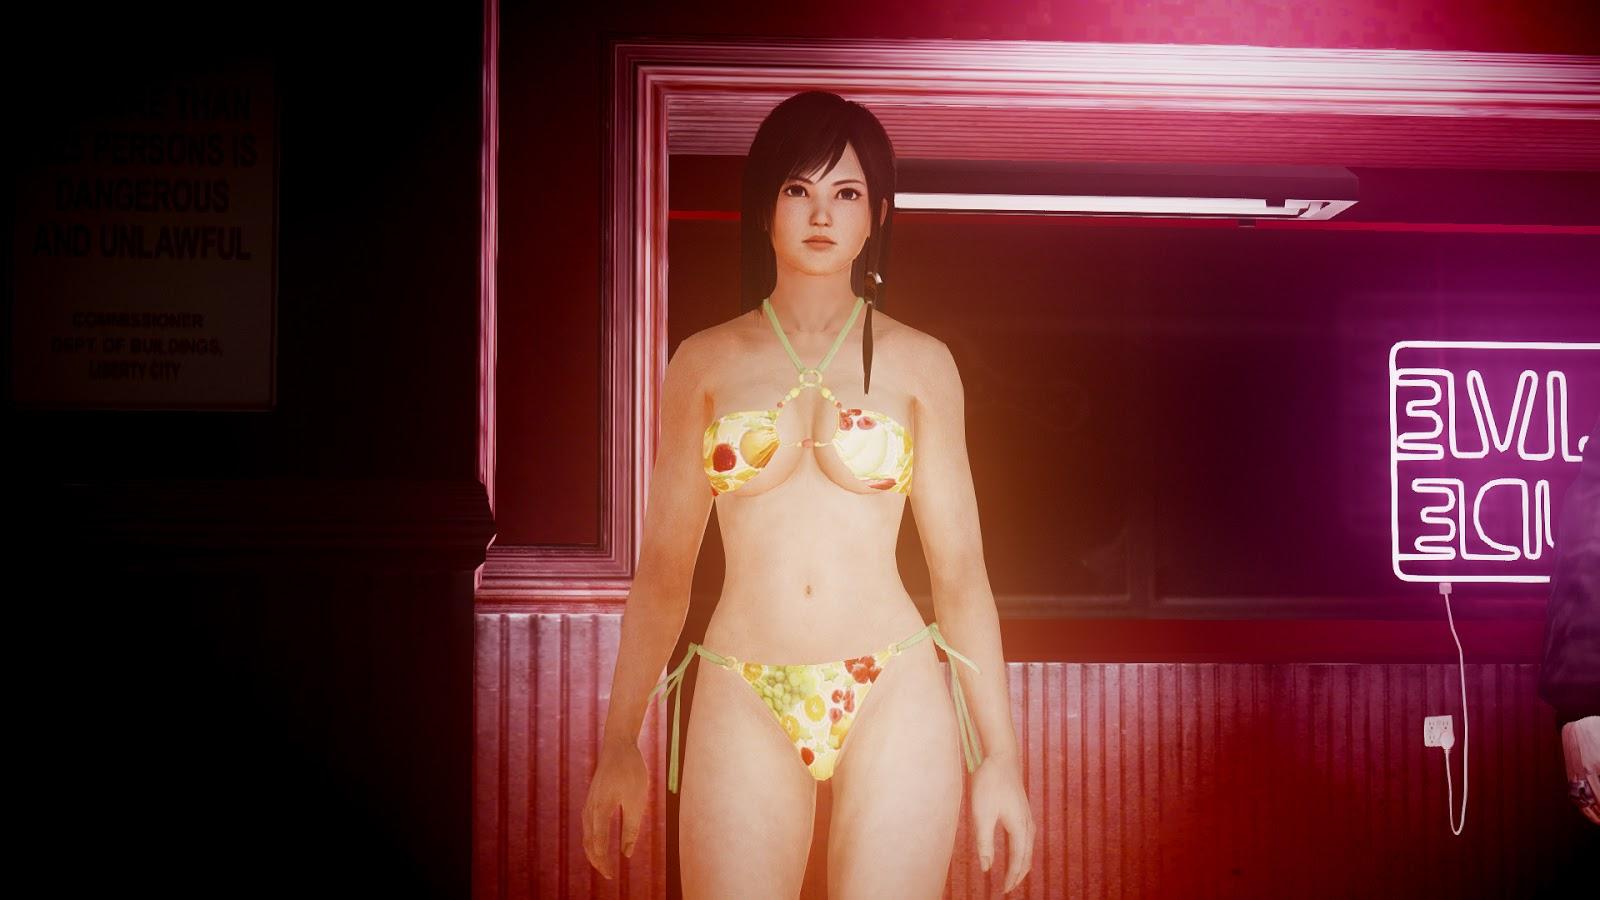 Vice city nude mods nackt movie